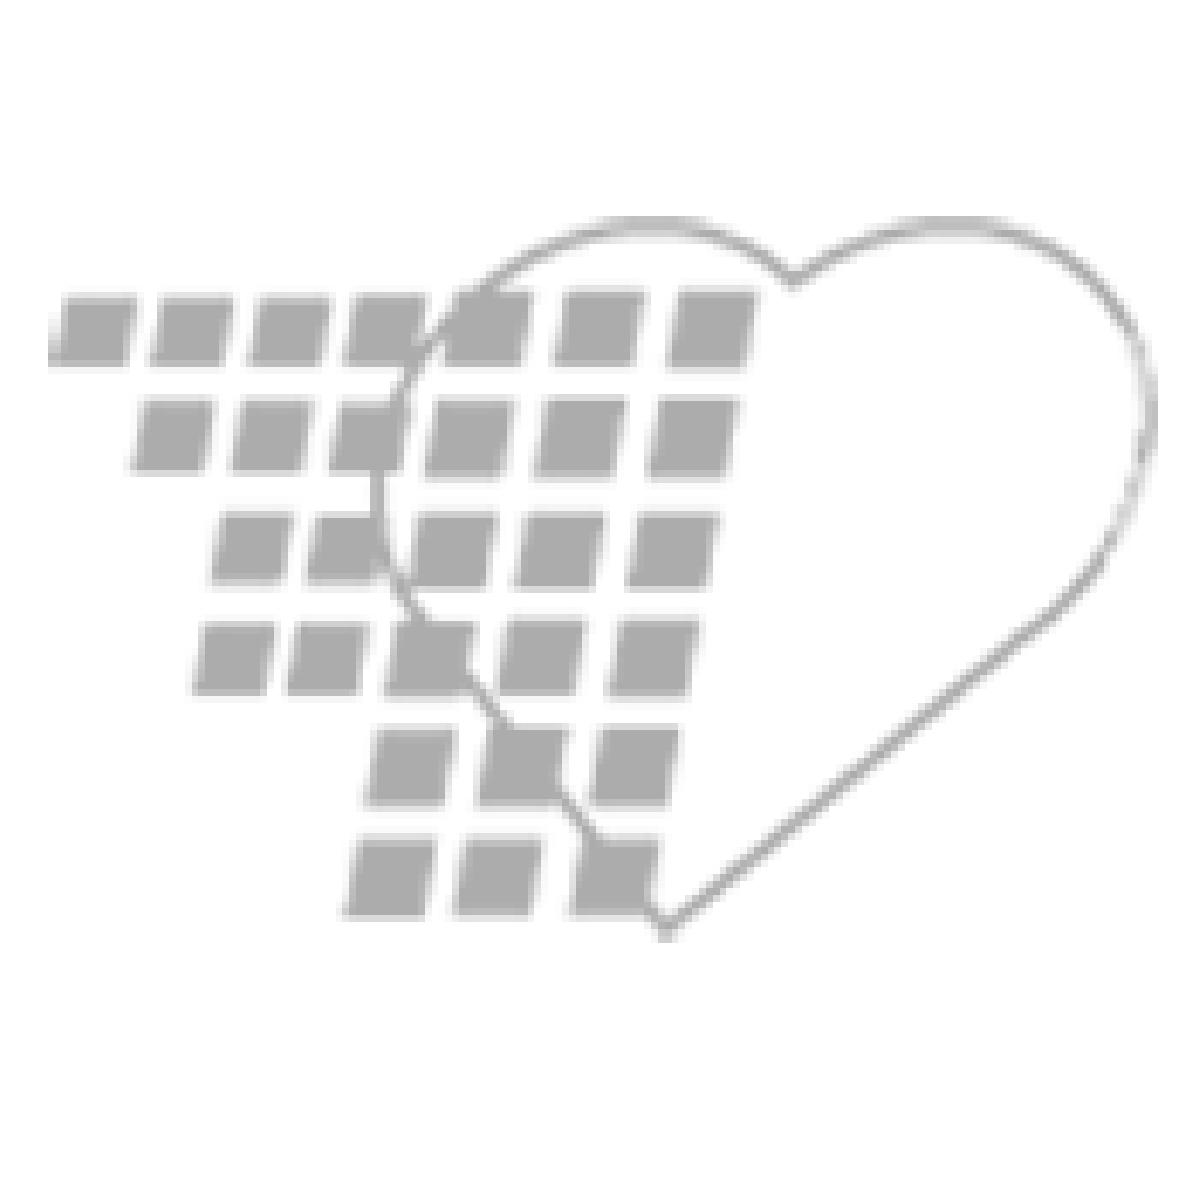 03-47-1032-SM - Latex Exam Gloves Singles - Small